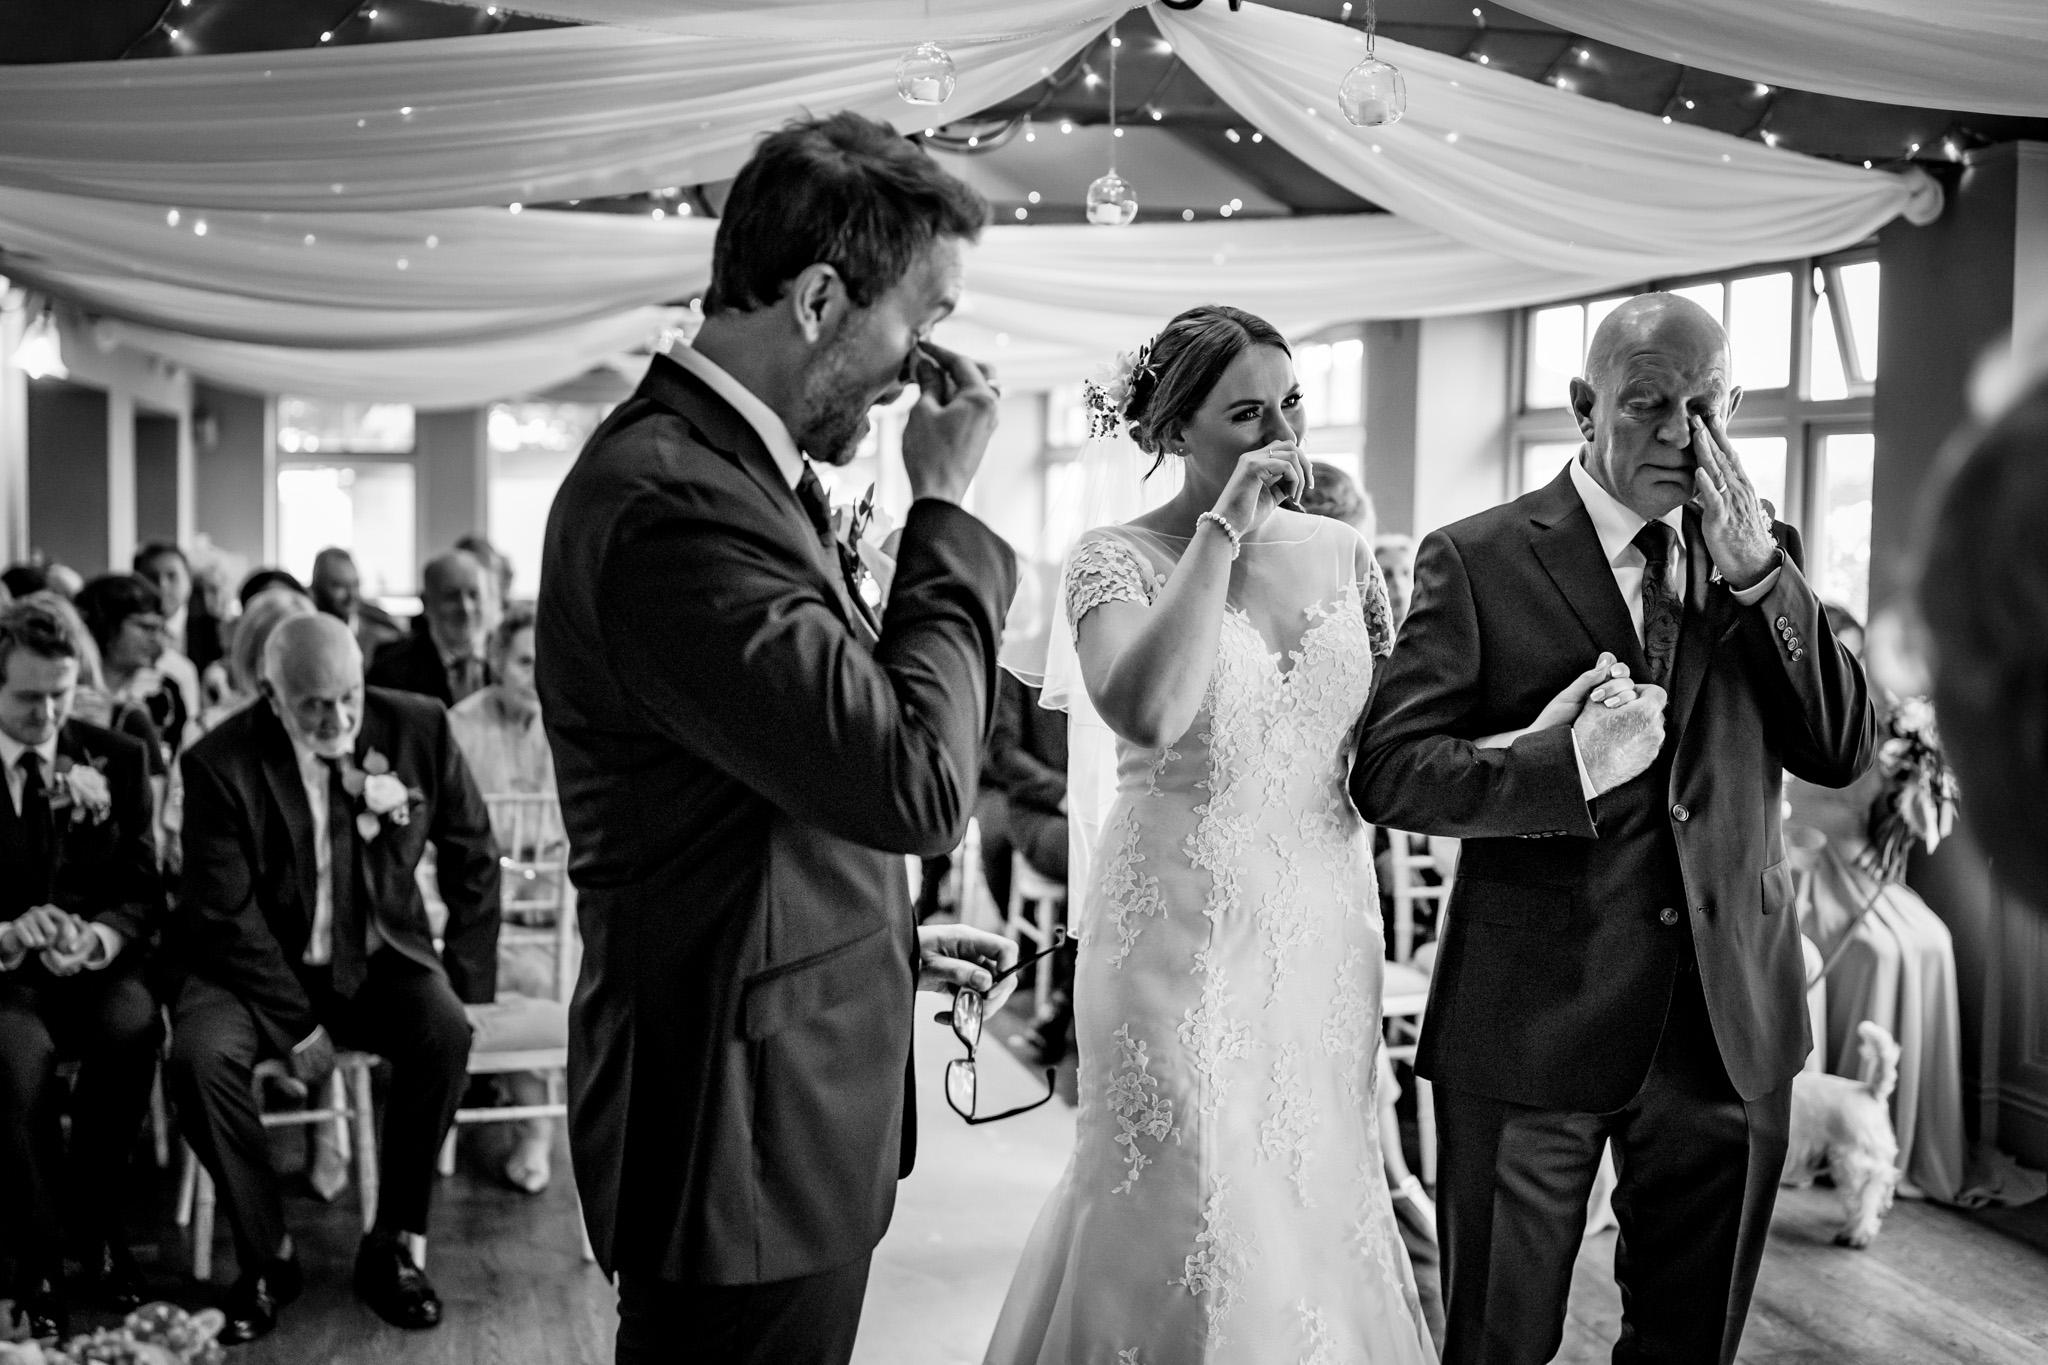 Alma Inn Wedding Photography, West Yorkshire Wedding Photographer, Bradford Wedding photography. Candid Photography